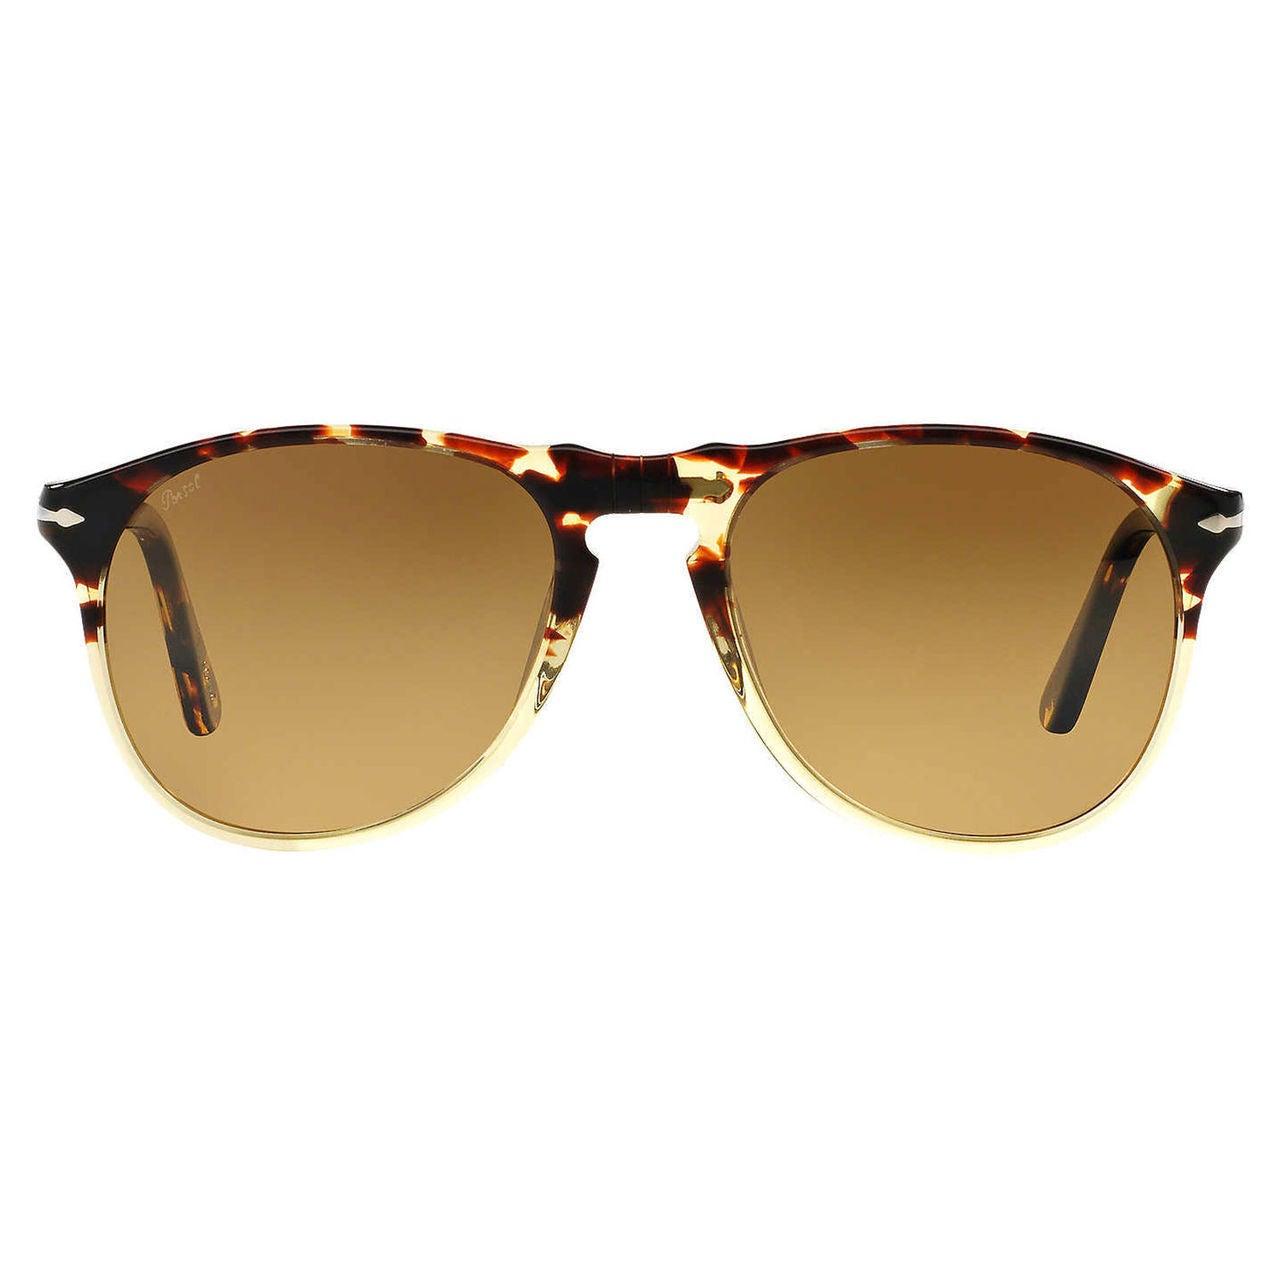 7bbc3646dd4 Shop Persol Men s PO9649S Plastic Pilot Polarized Sunglasses - Tortoise -  Large - Free Shipping Today - Overstock.com - 10437815